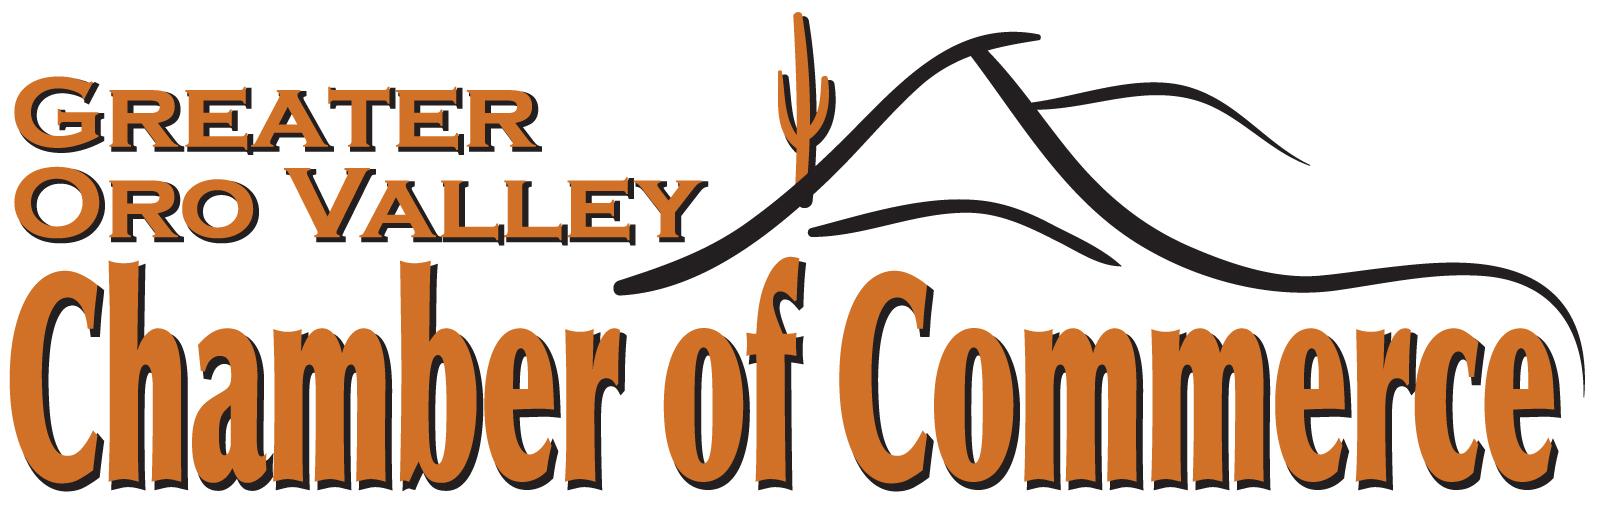 OV chamber logo